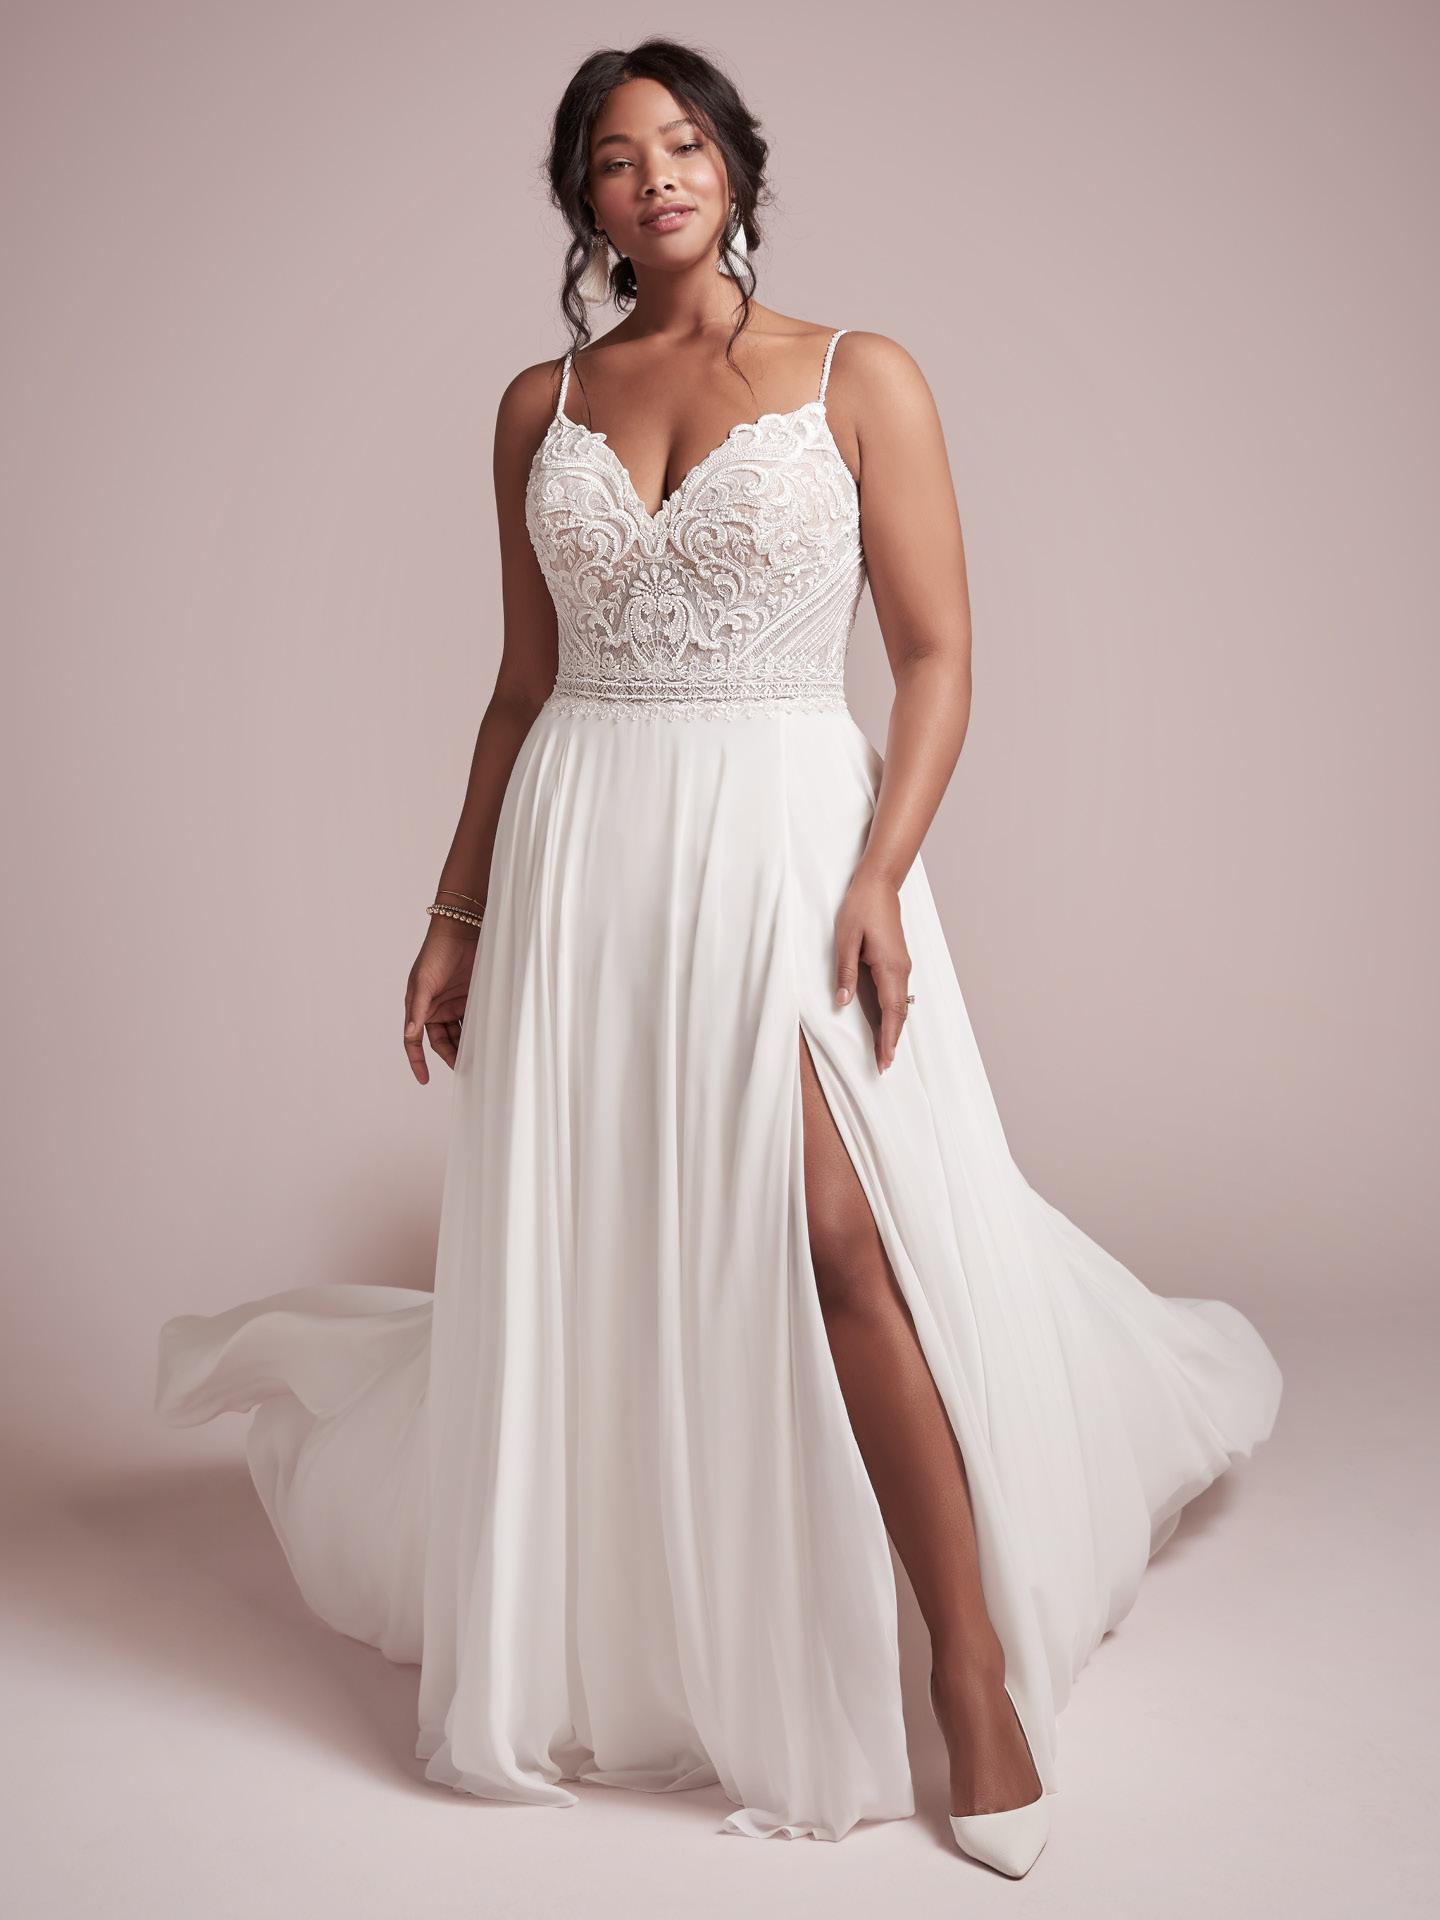 Curvy Model Wearing Plus Size Beach Chiffon Wedding Gown Called Lorrained by Rebecca Ingram